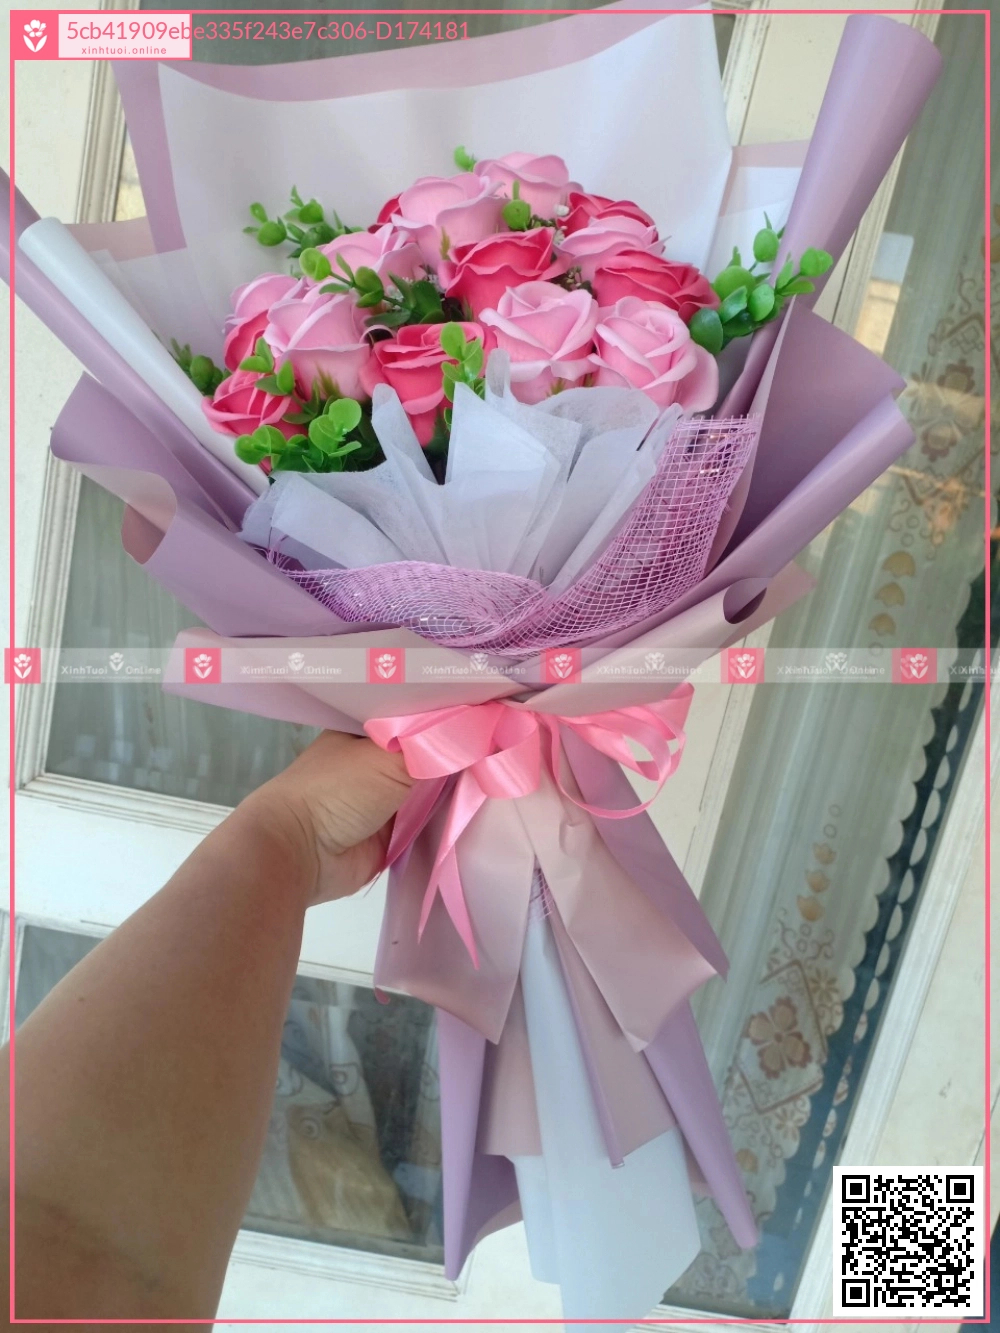 Happy Valentine - D174181 - xinhtuoi.online